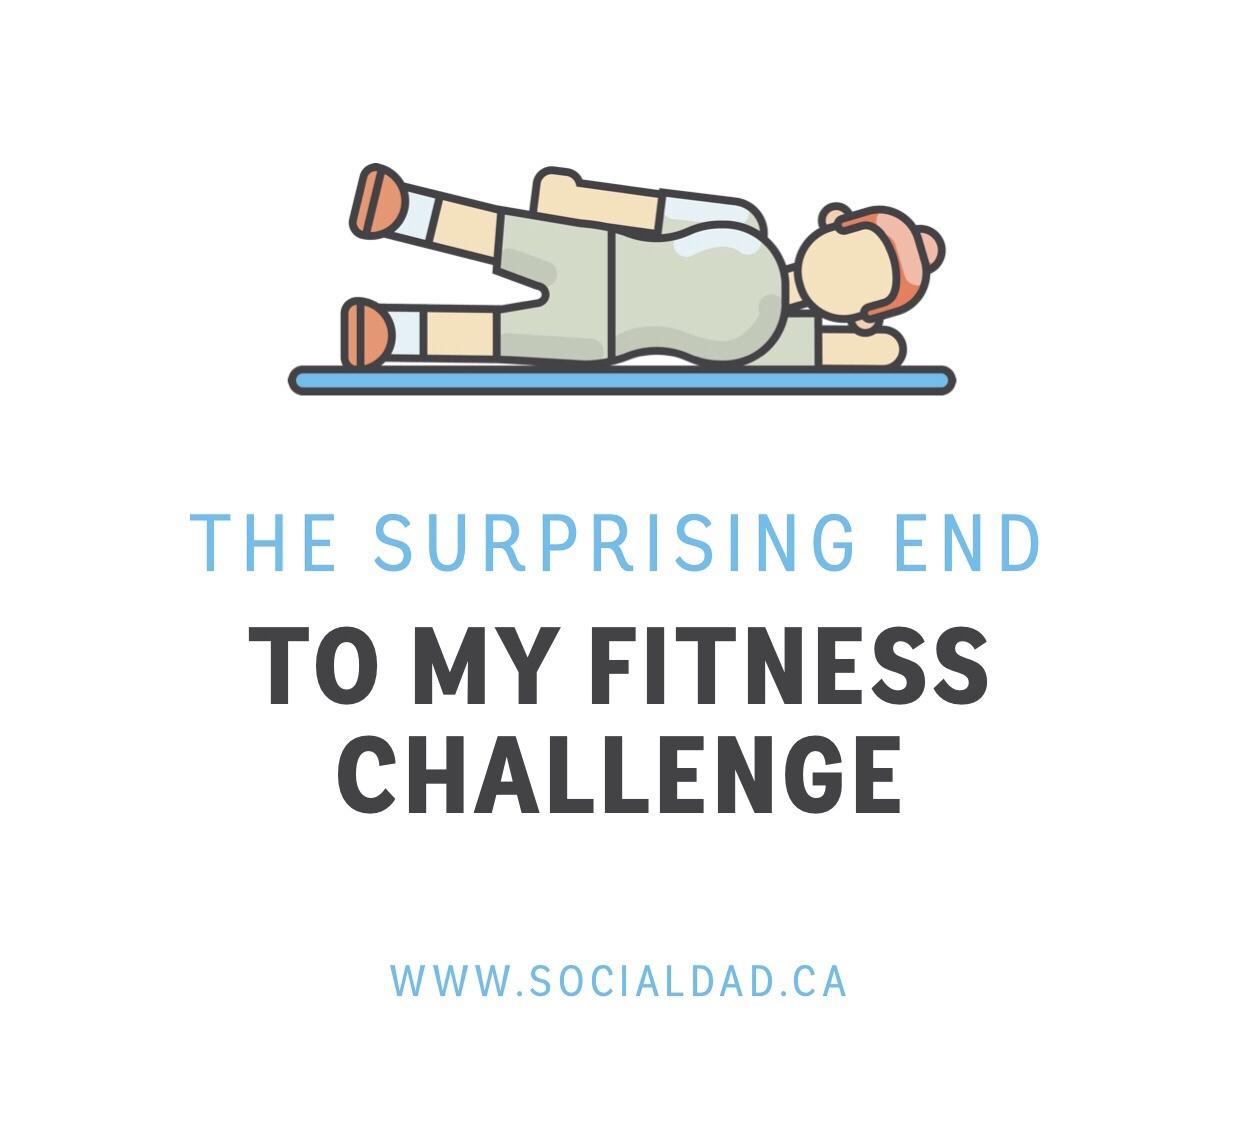 Fitness Challenge, Vancouver Dad Blog, socialdad90day, steve nash fitness world, steve nash, fitness, vancouver blog, vancouver dad blog, canadian parenting blogs, best parenting blogs, dad blogs, dad blog, fatherhood,